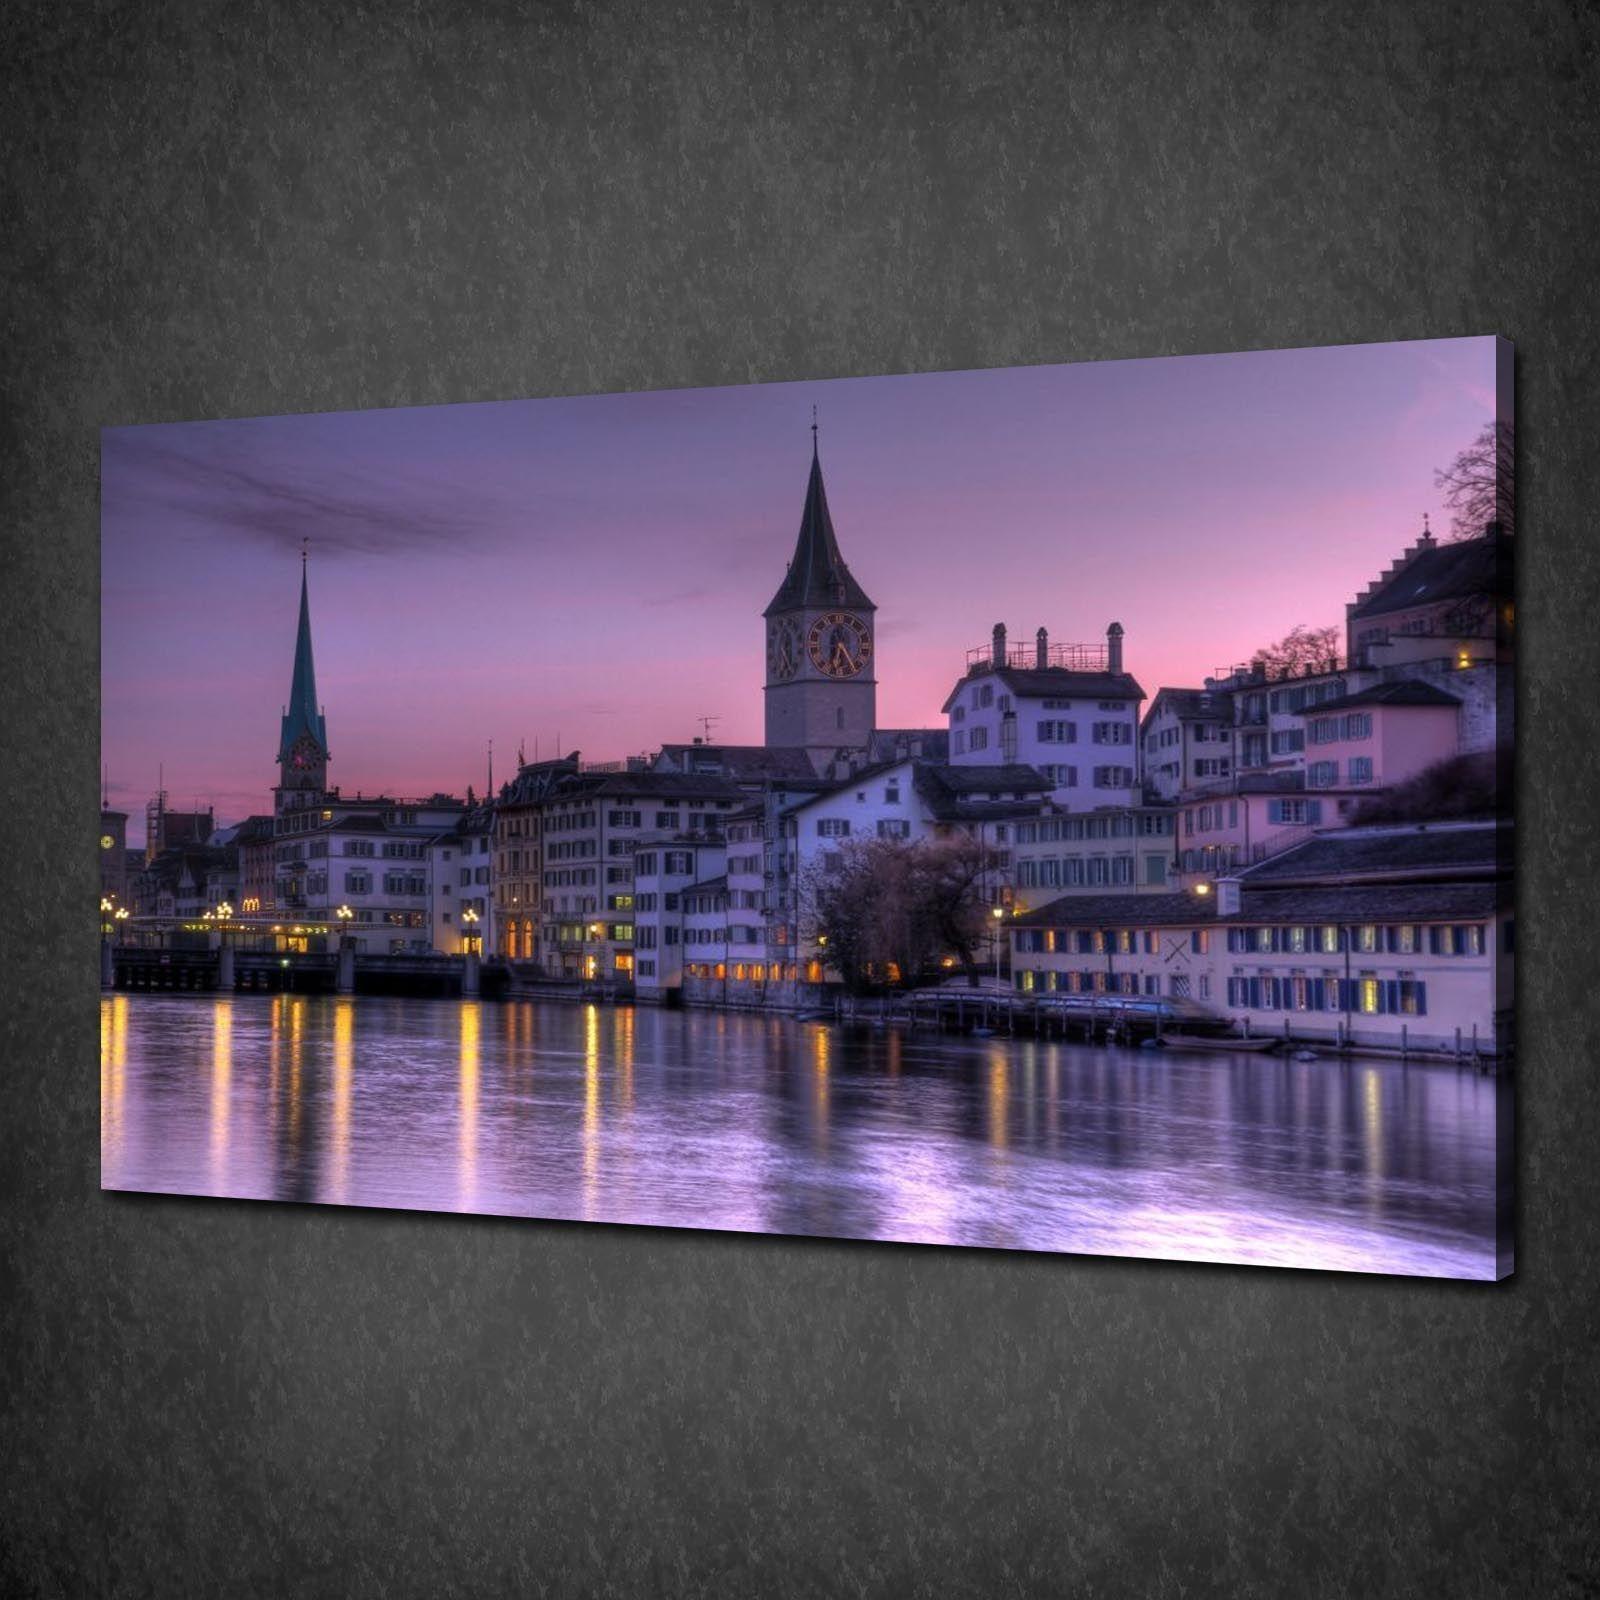 lila SKY ZURICH SWITZERLAND SKYLINE BOX CANVAS PRINT WALL ART PICTURE